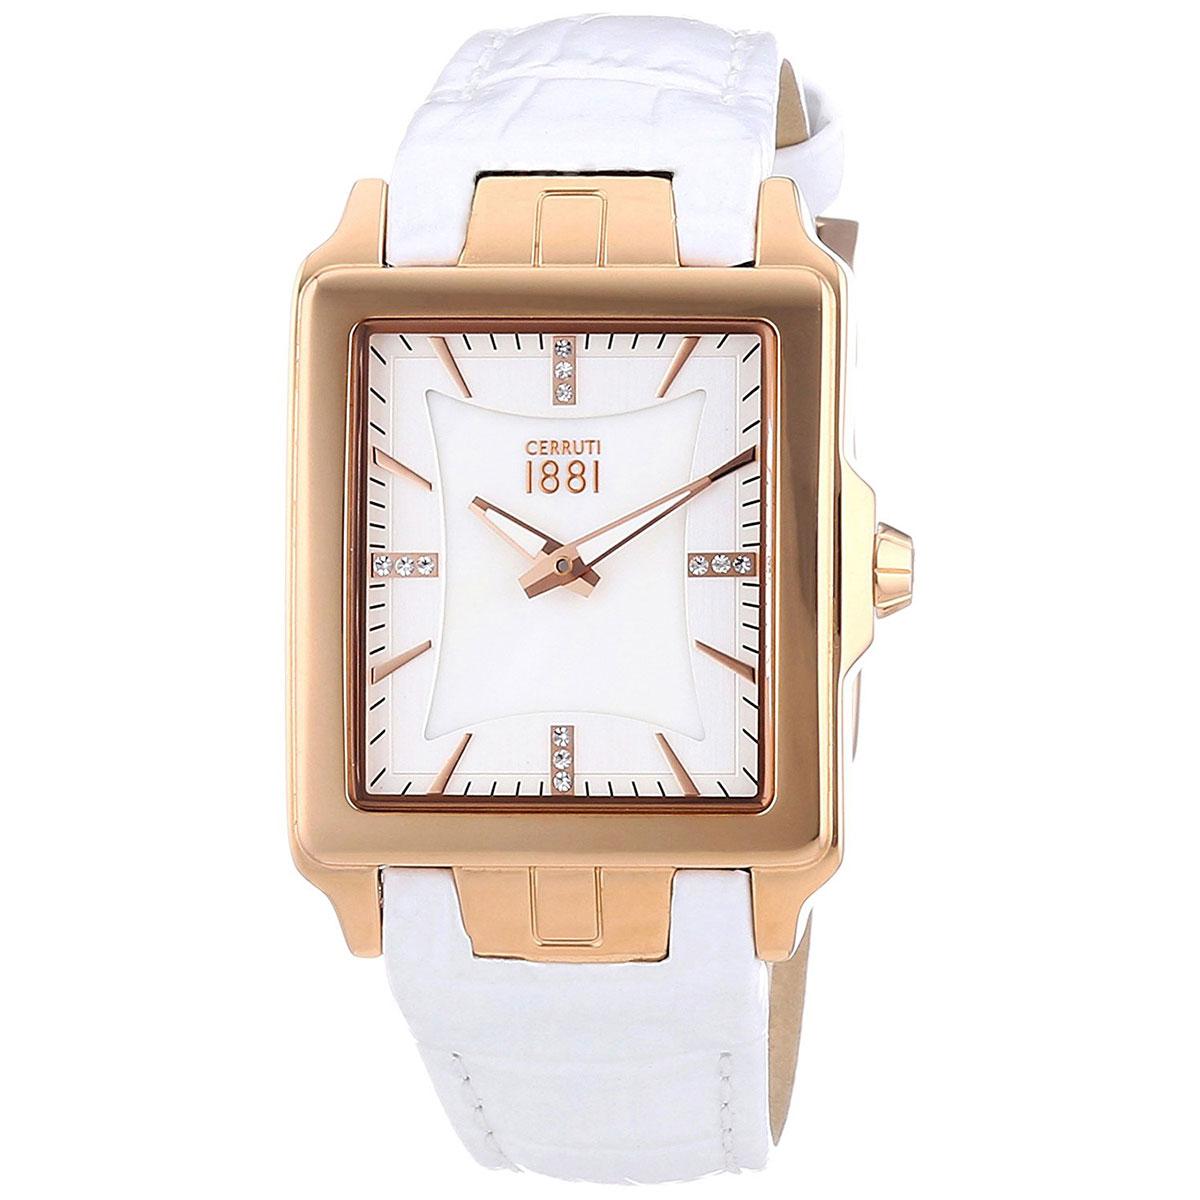 CERRUTI 1881 チェルッティ1881 電池式クォーツ 腕時計 [CRC014C216A] 並行輸入品 ホワイト(白)